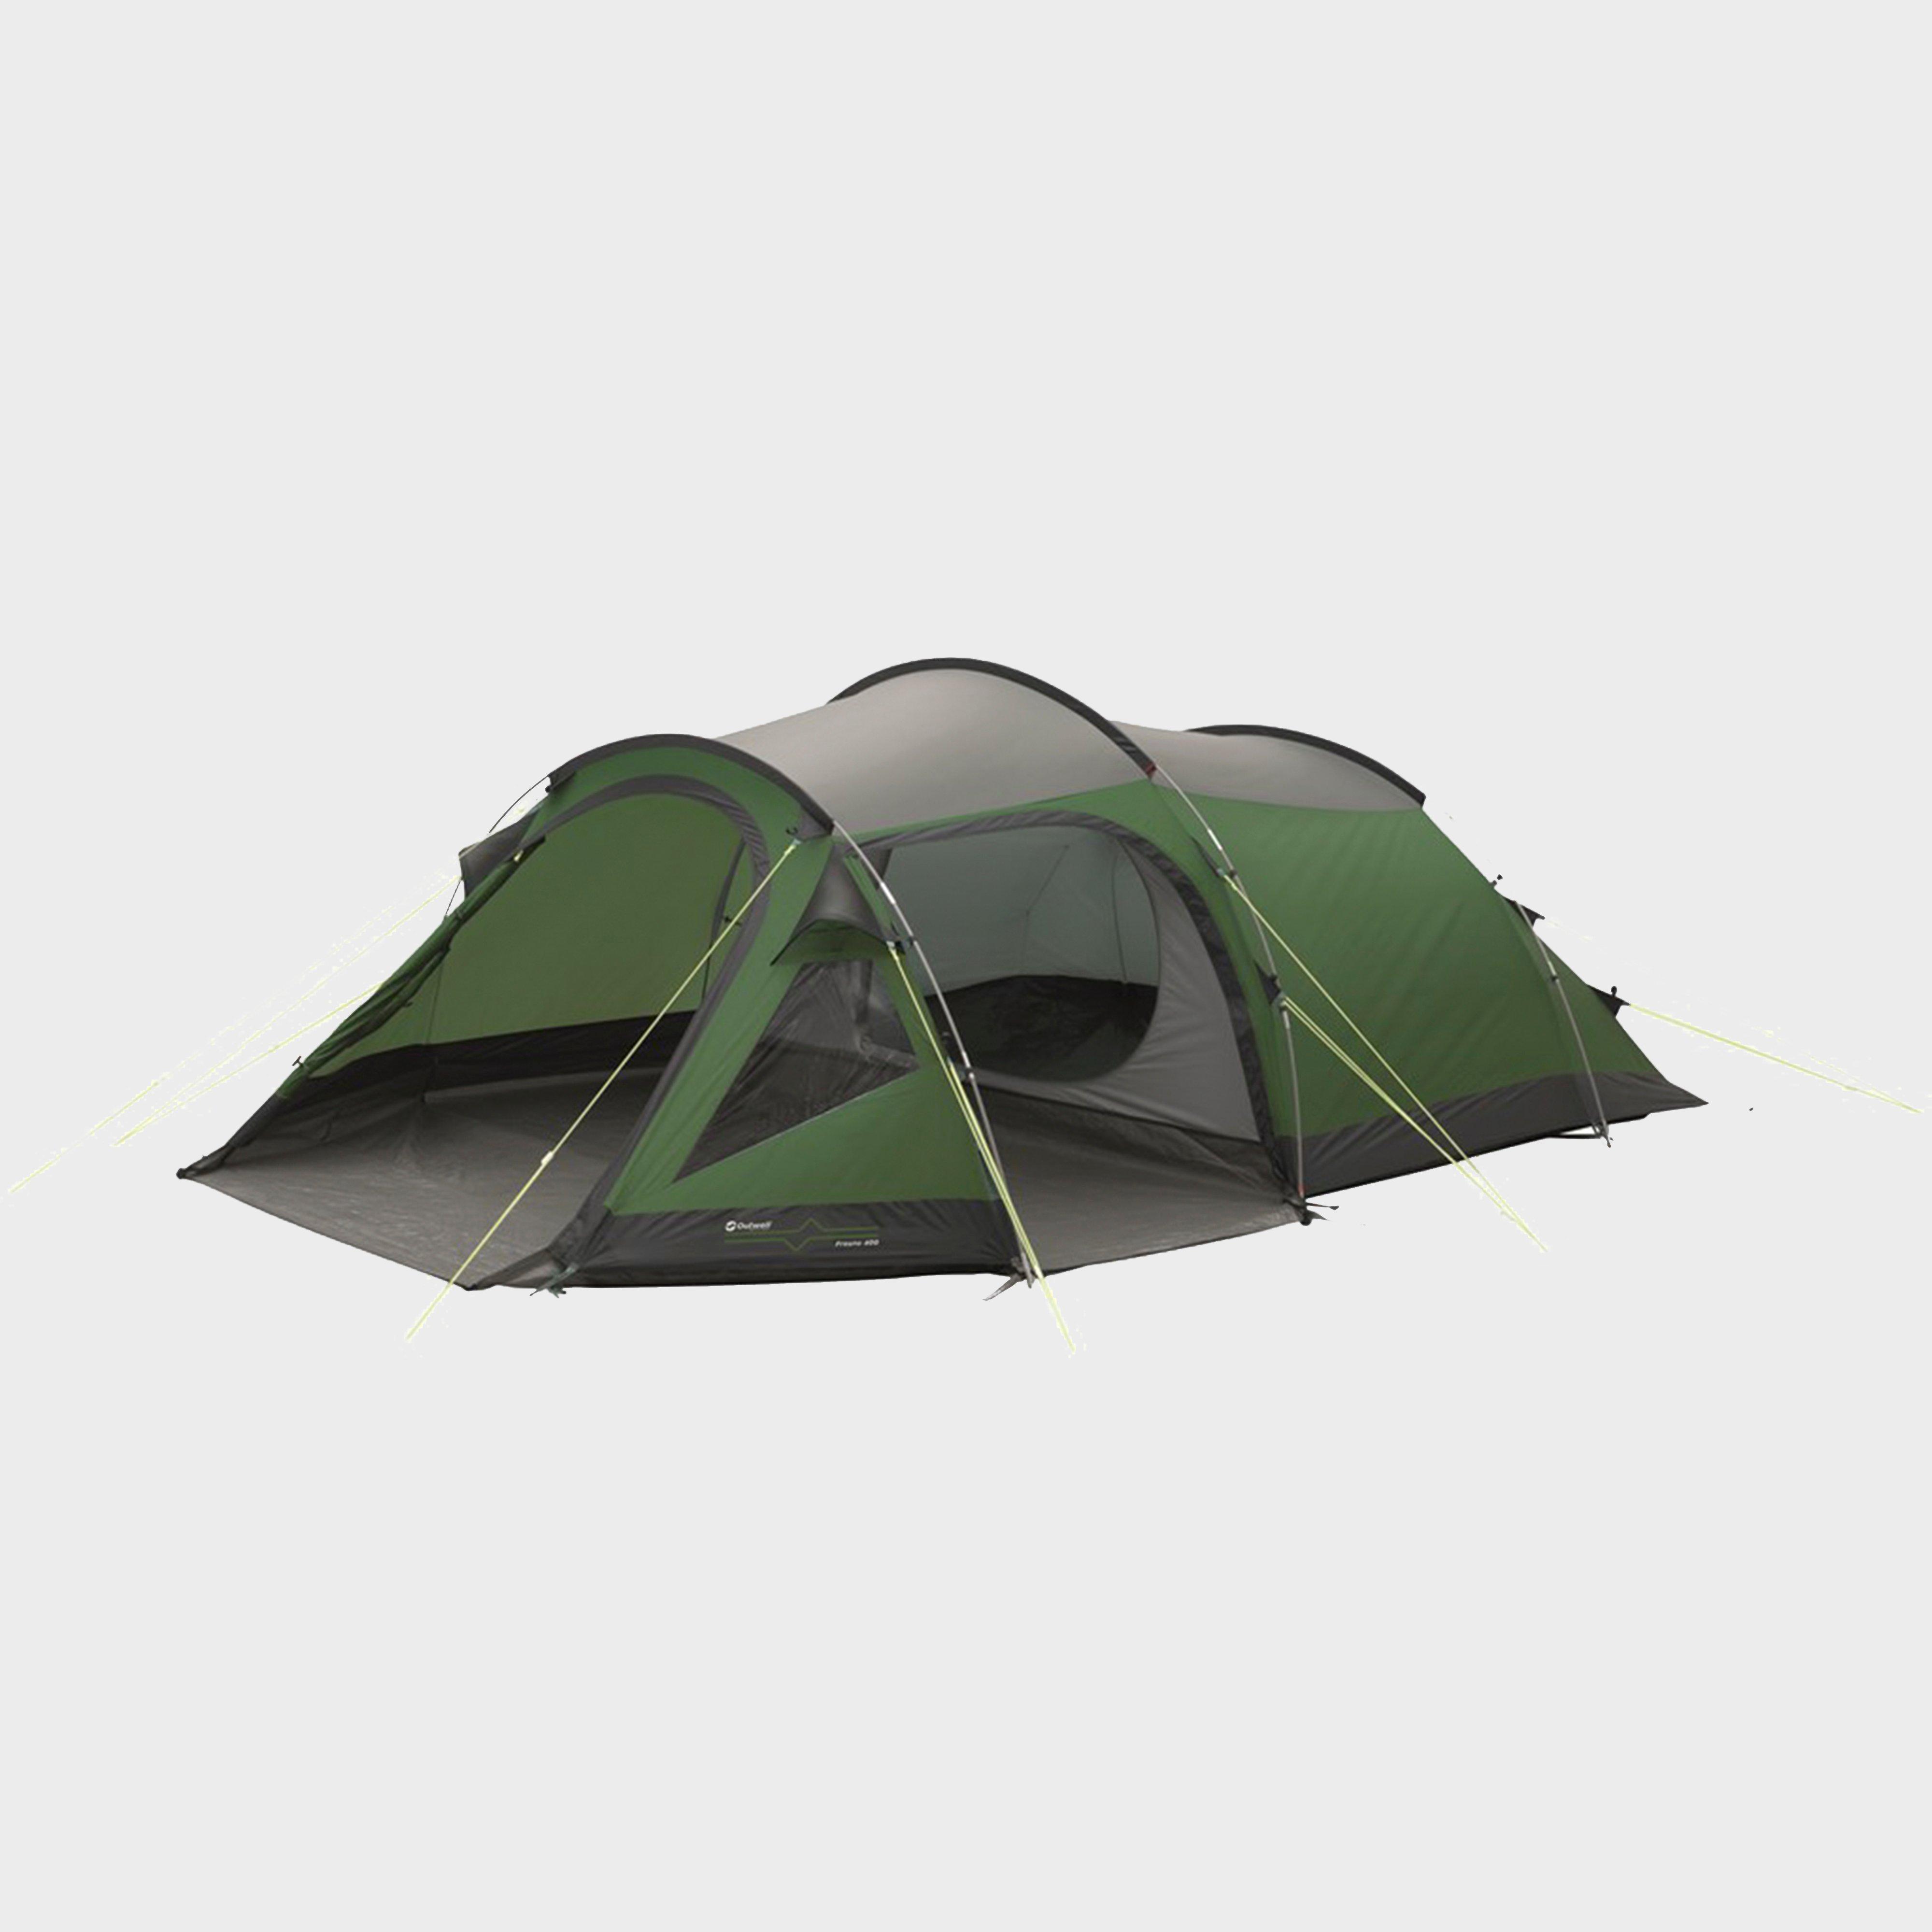 Fresno 400 Family Tent & 4 u0026 5 Man Tents | 4 u0026 5 Person Family Tents | Millets